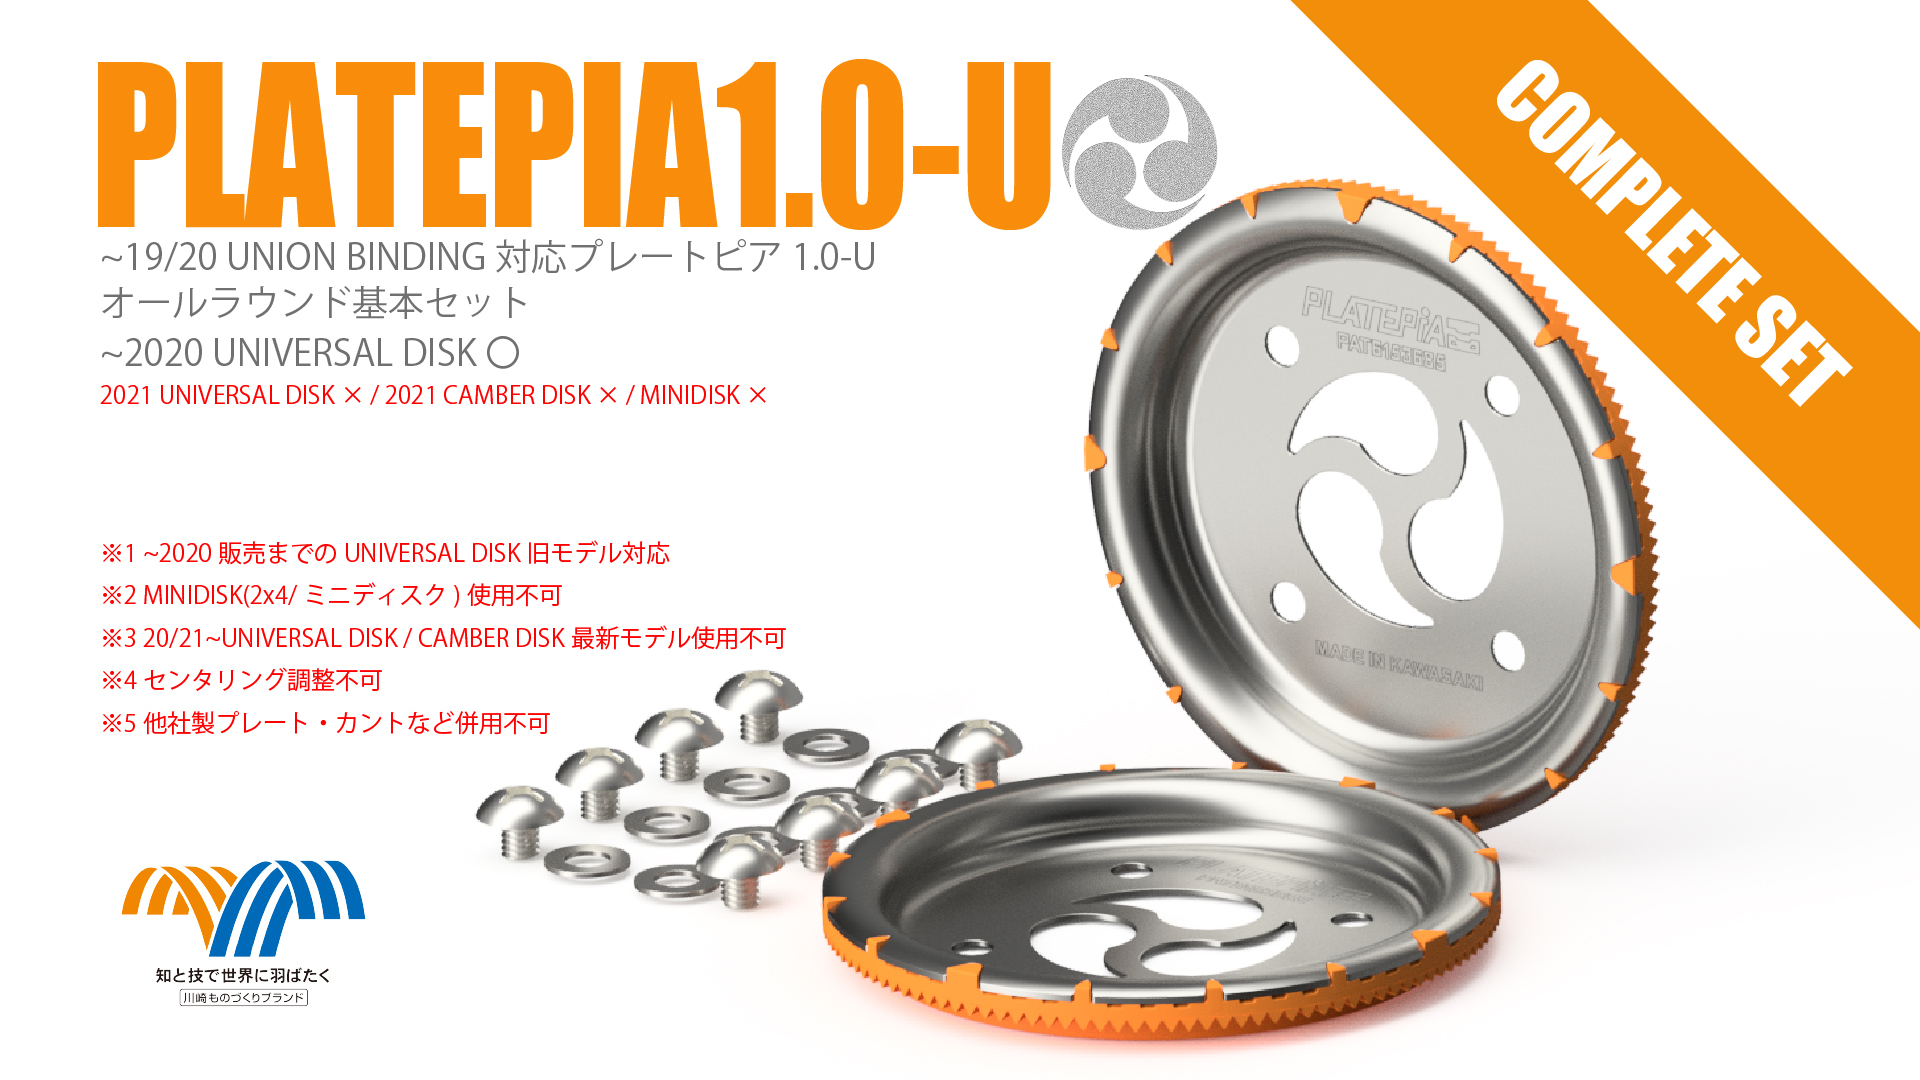 PLATEPIA1.0-U